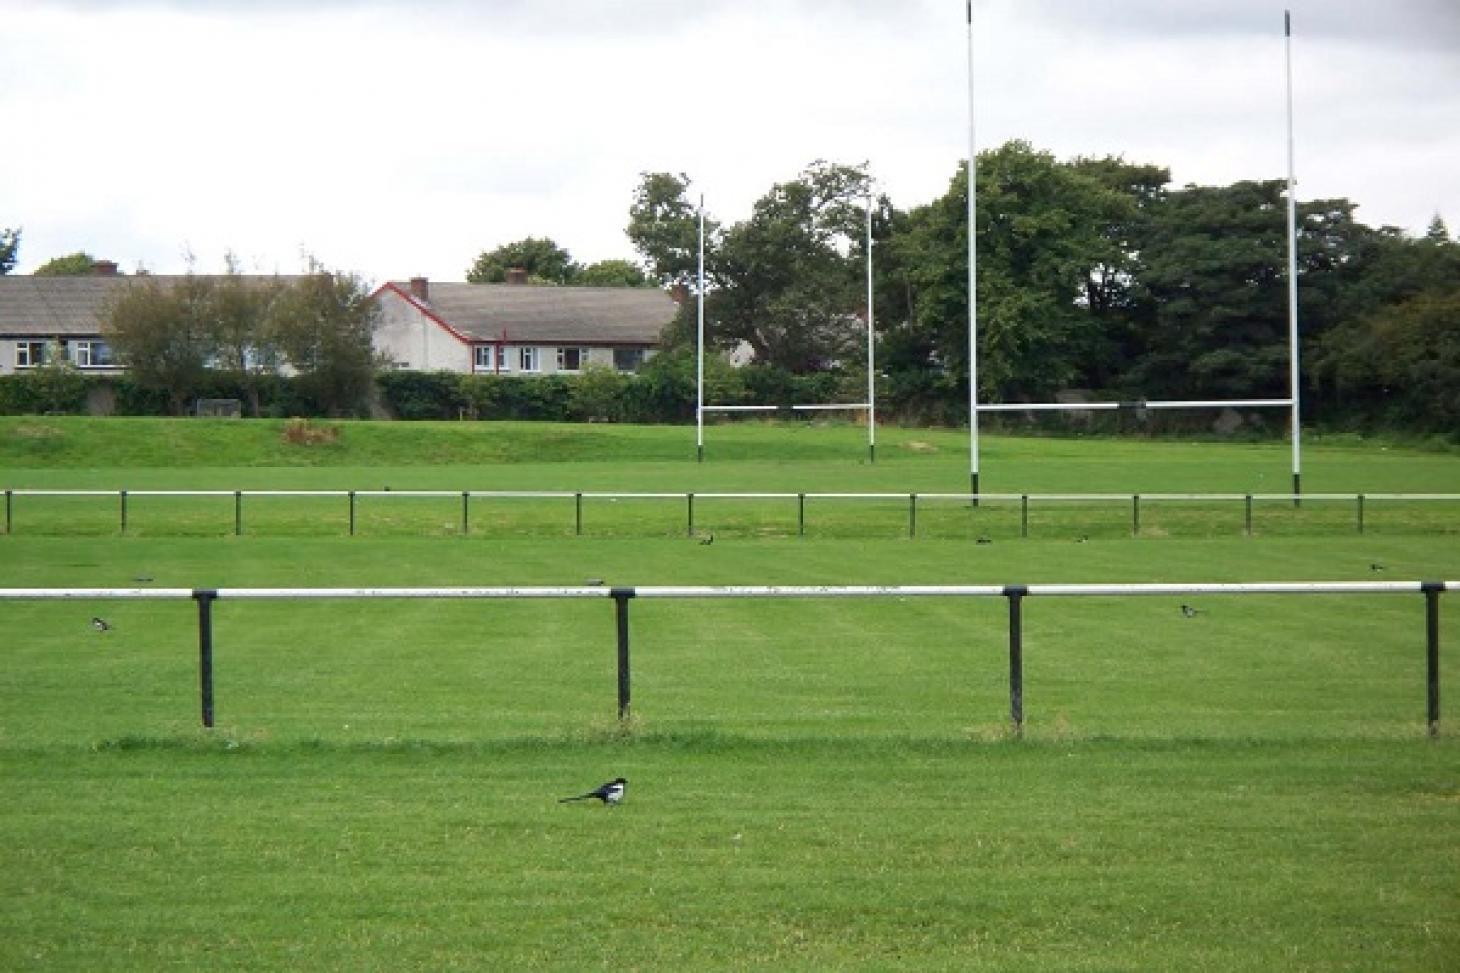 Hyde Park 11 a side | Grass football pitch